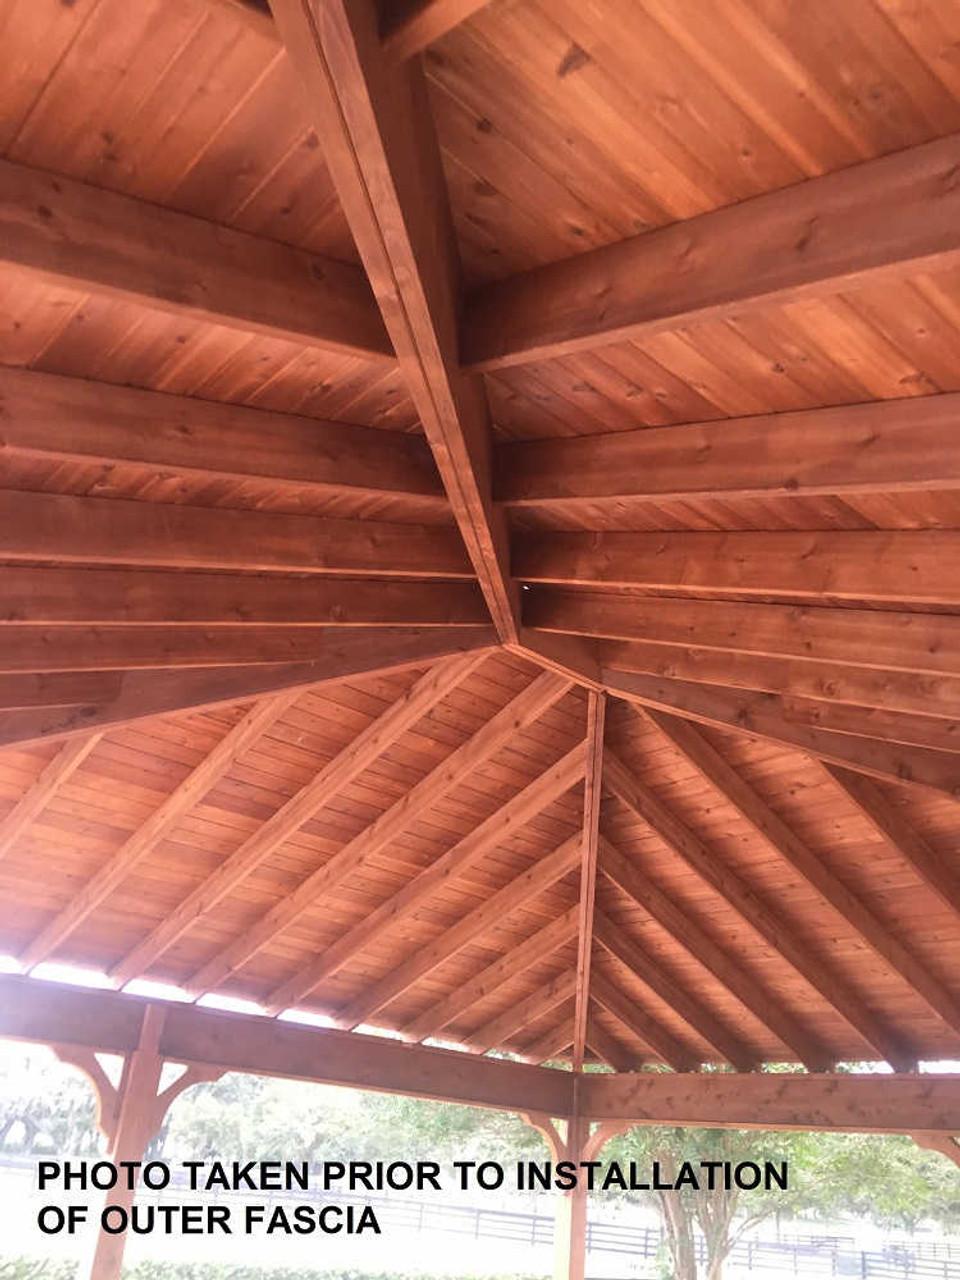 24x26 Red Cedar Trad'l Roof Pavilion Kit Before installation, The Villages, FL